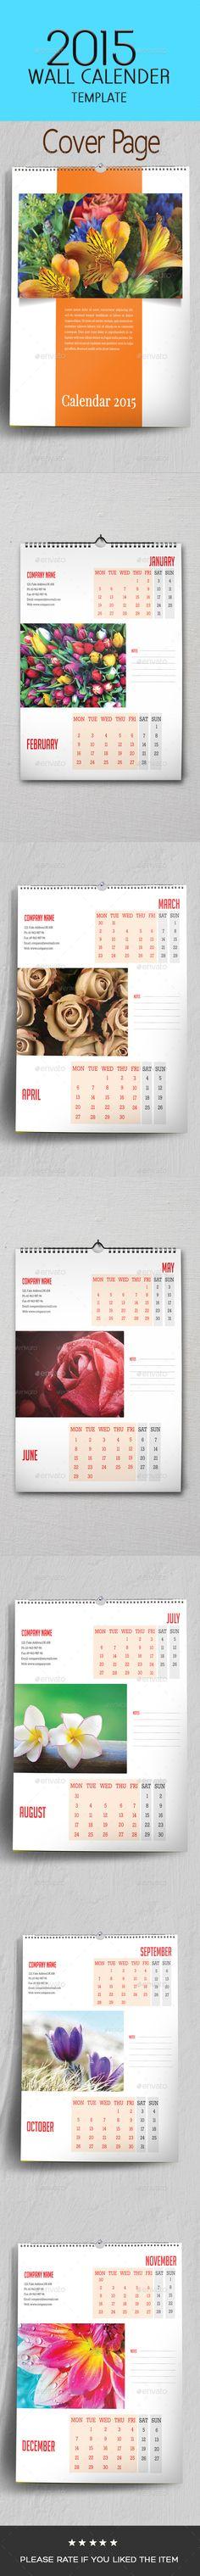 Corporate Business Wall Calendar 2018 V07 Calendar 2017 Corporate